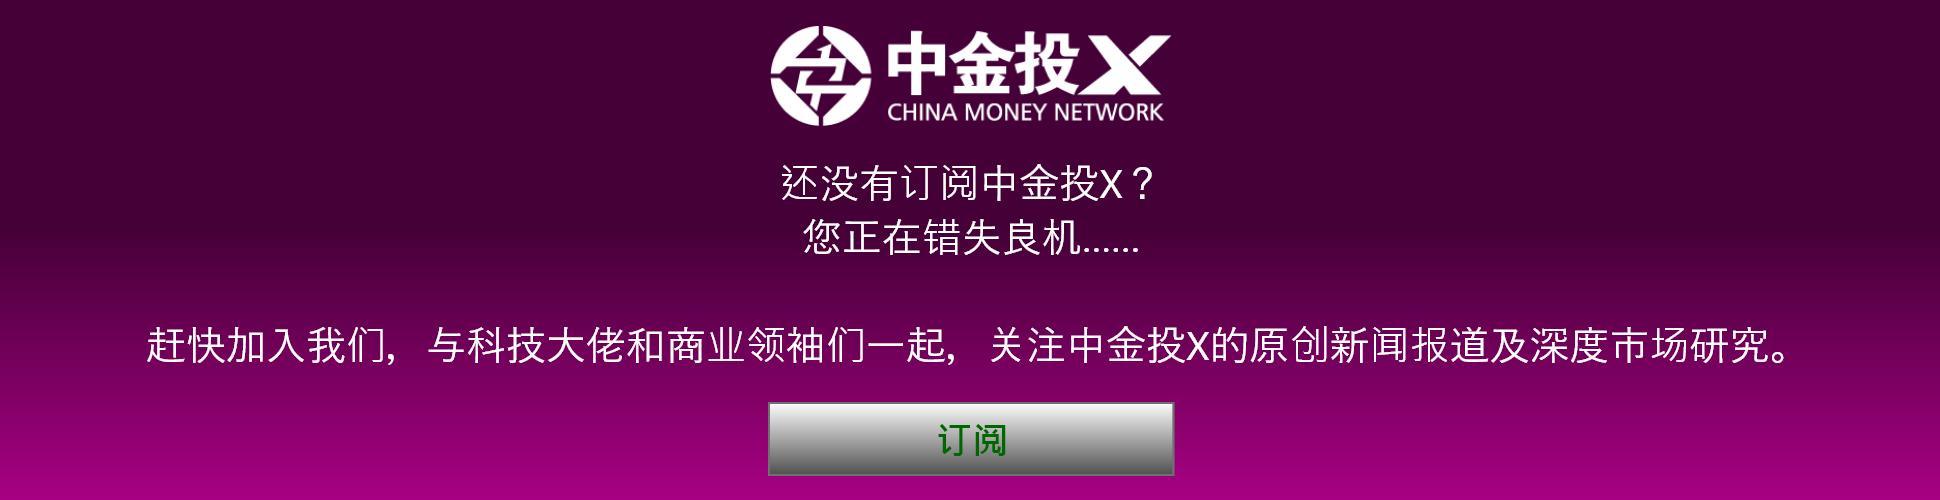 China Money Network Subscription